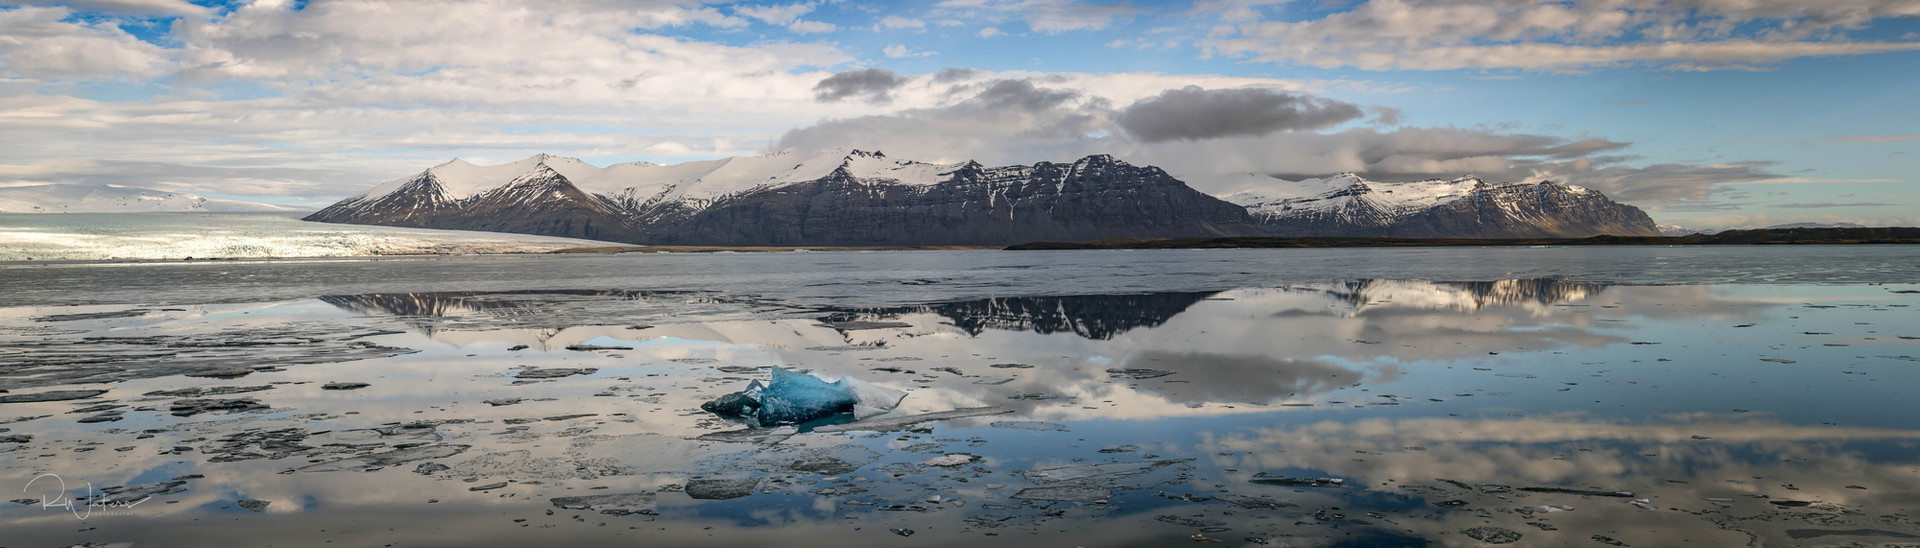 Iceland-121